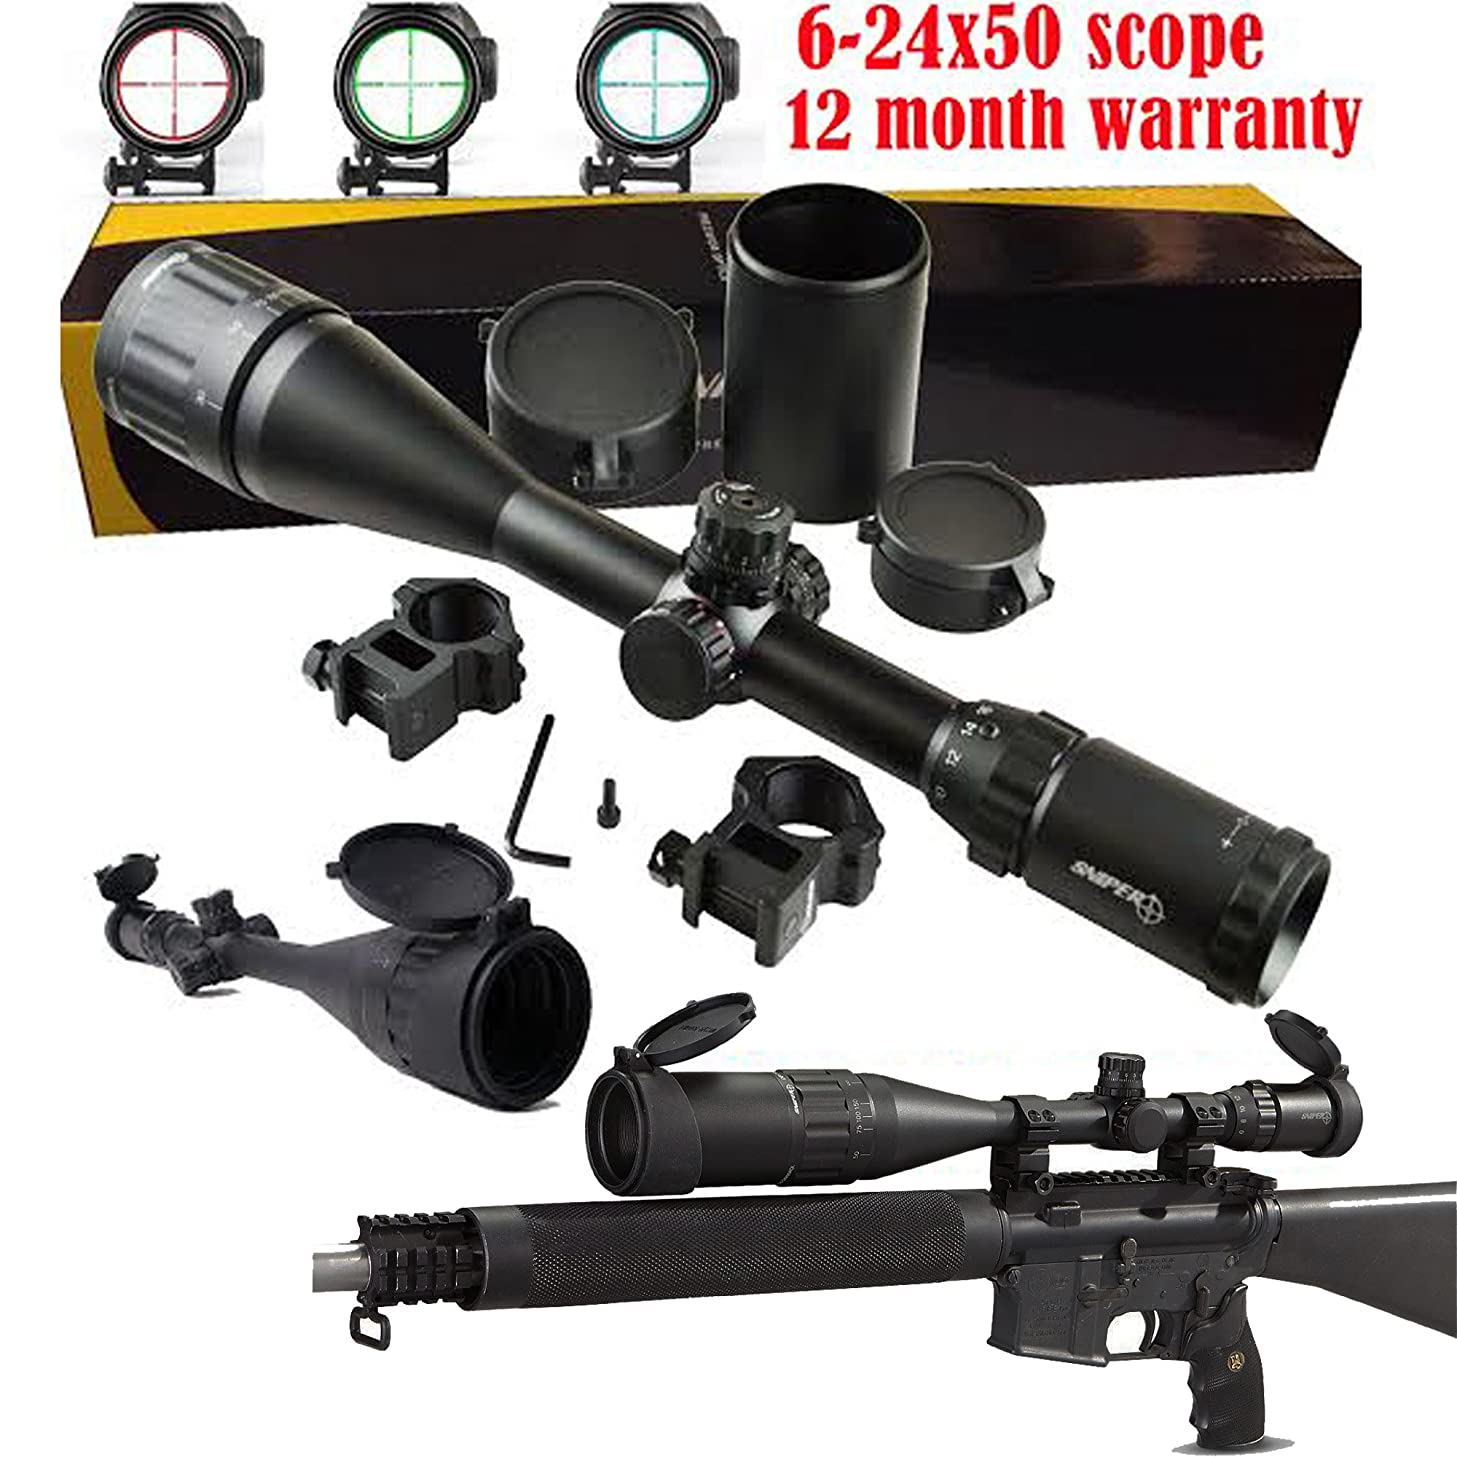 SNIPER? 6-24x50 AOE Illuminated Rifle Hunting Sniper Scope